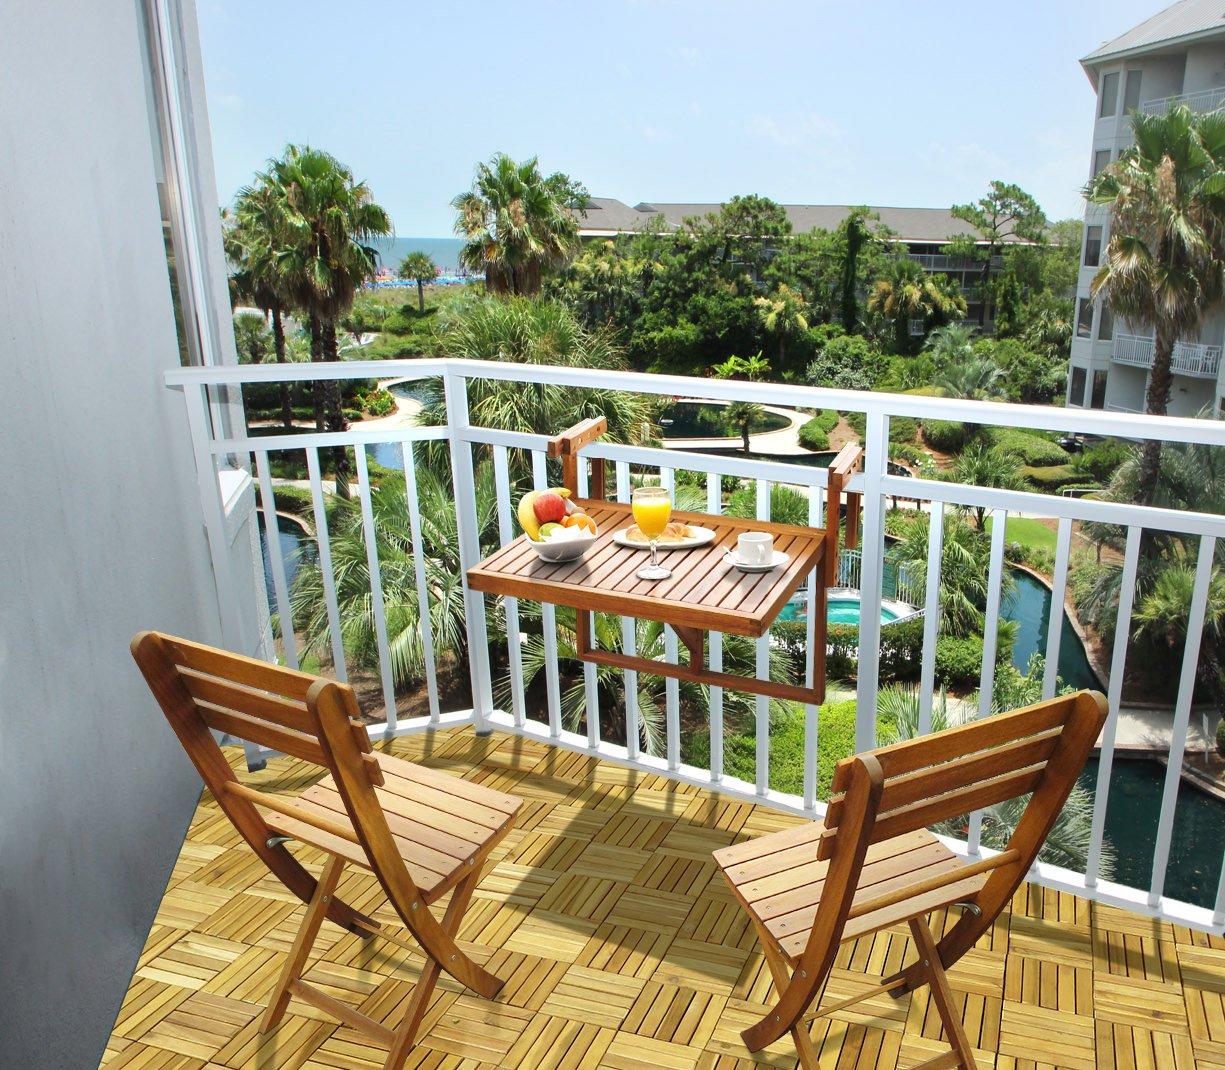 Amazon.com : INTERBUILD REAL WOOD Balcony Table & Sofia ...